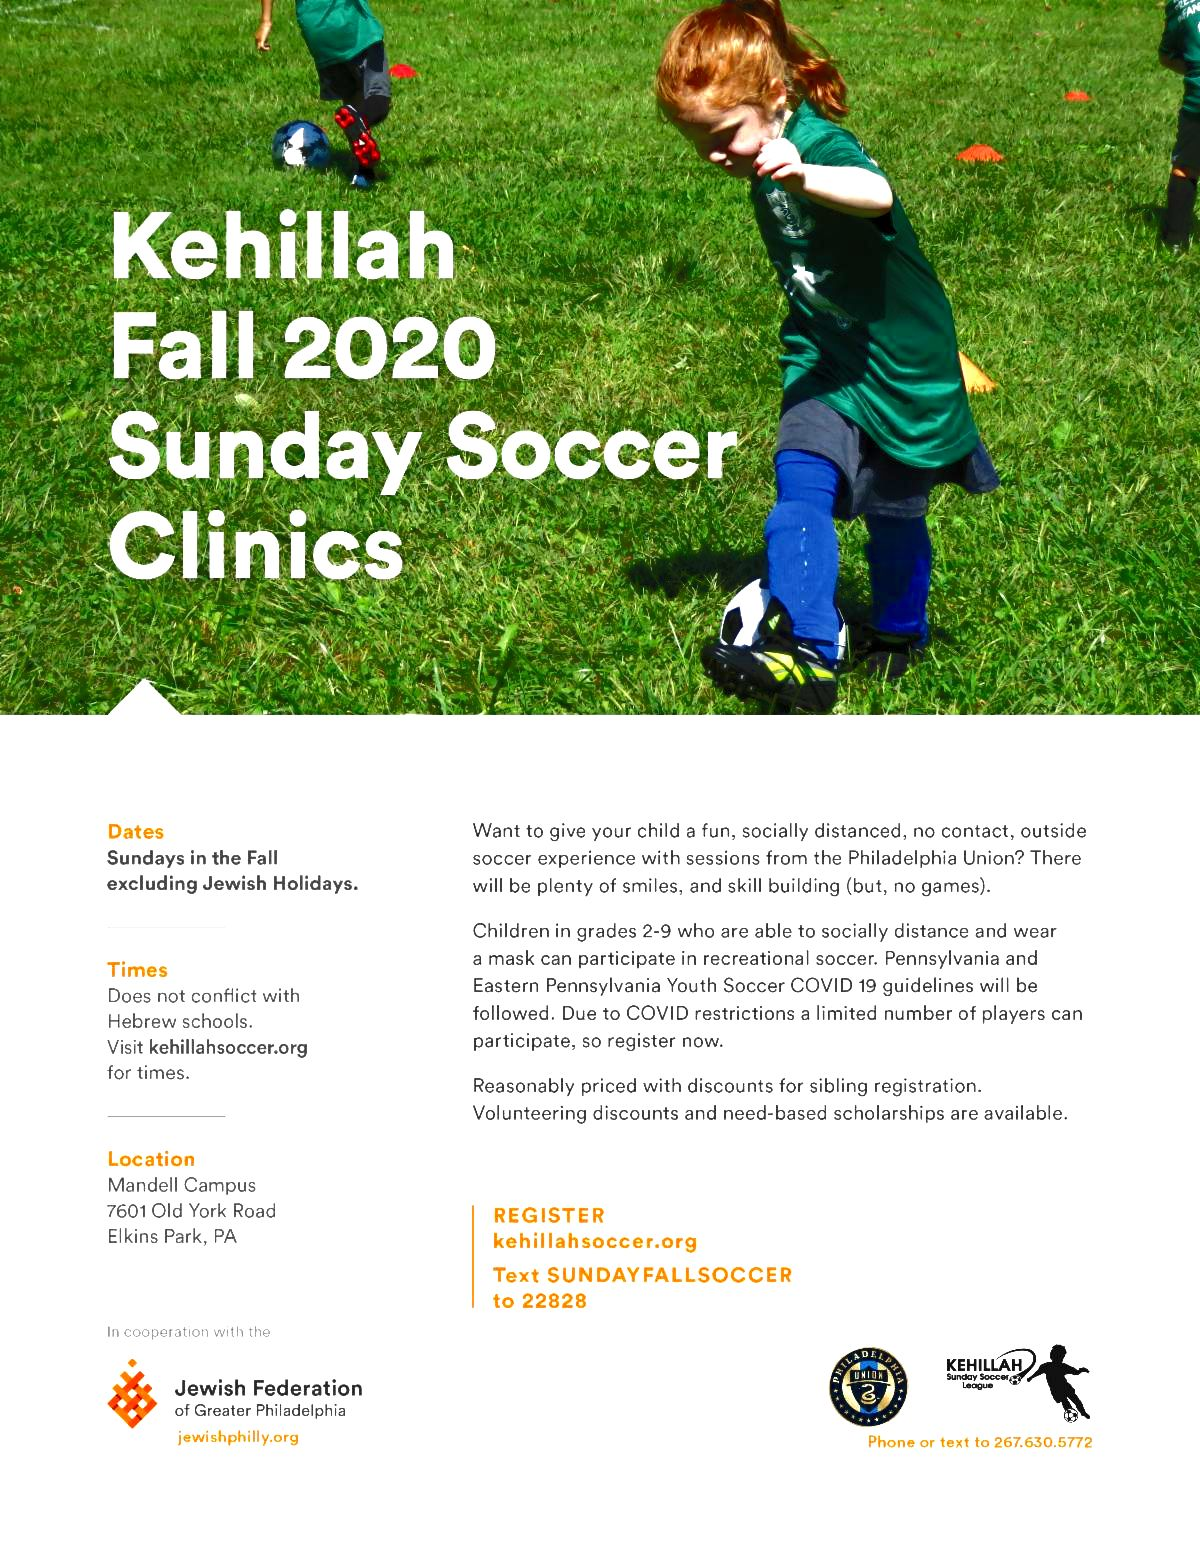 Kehillah Fall Sunday Soccer Clinic begins on 10/25